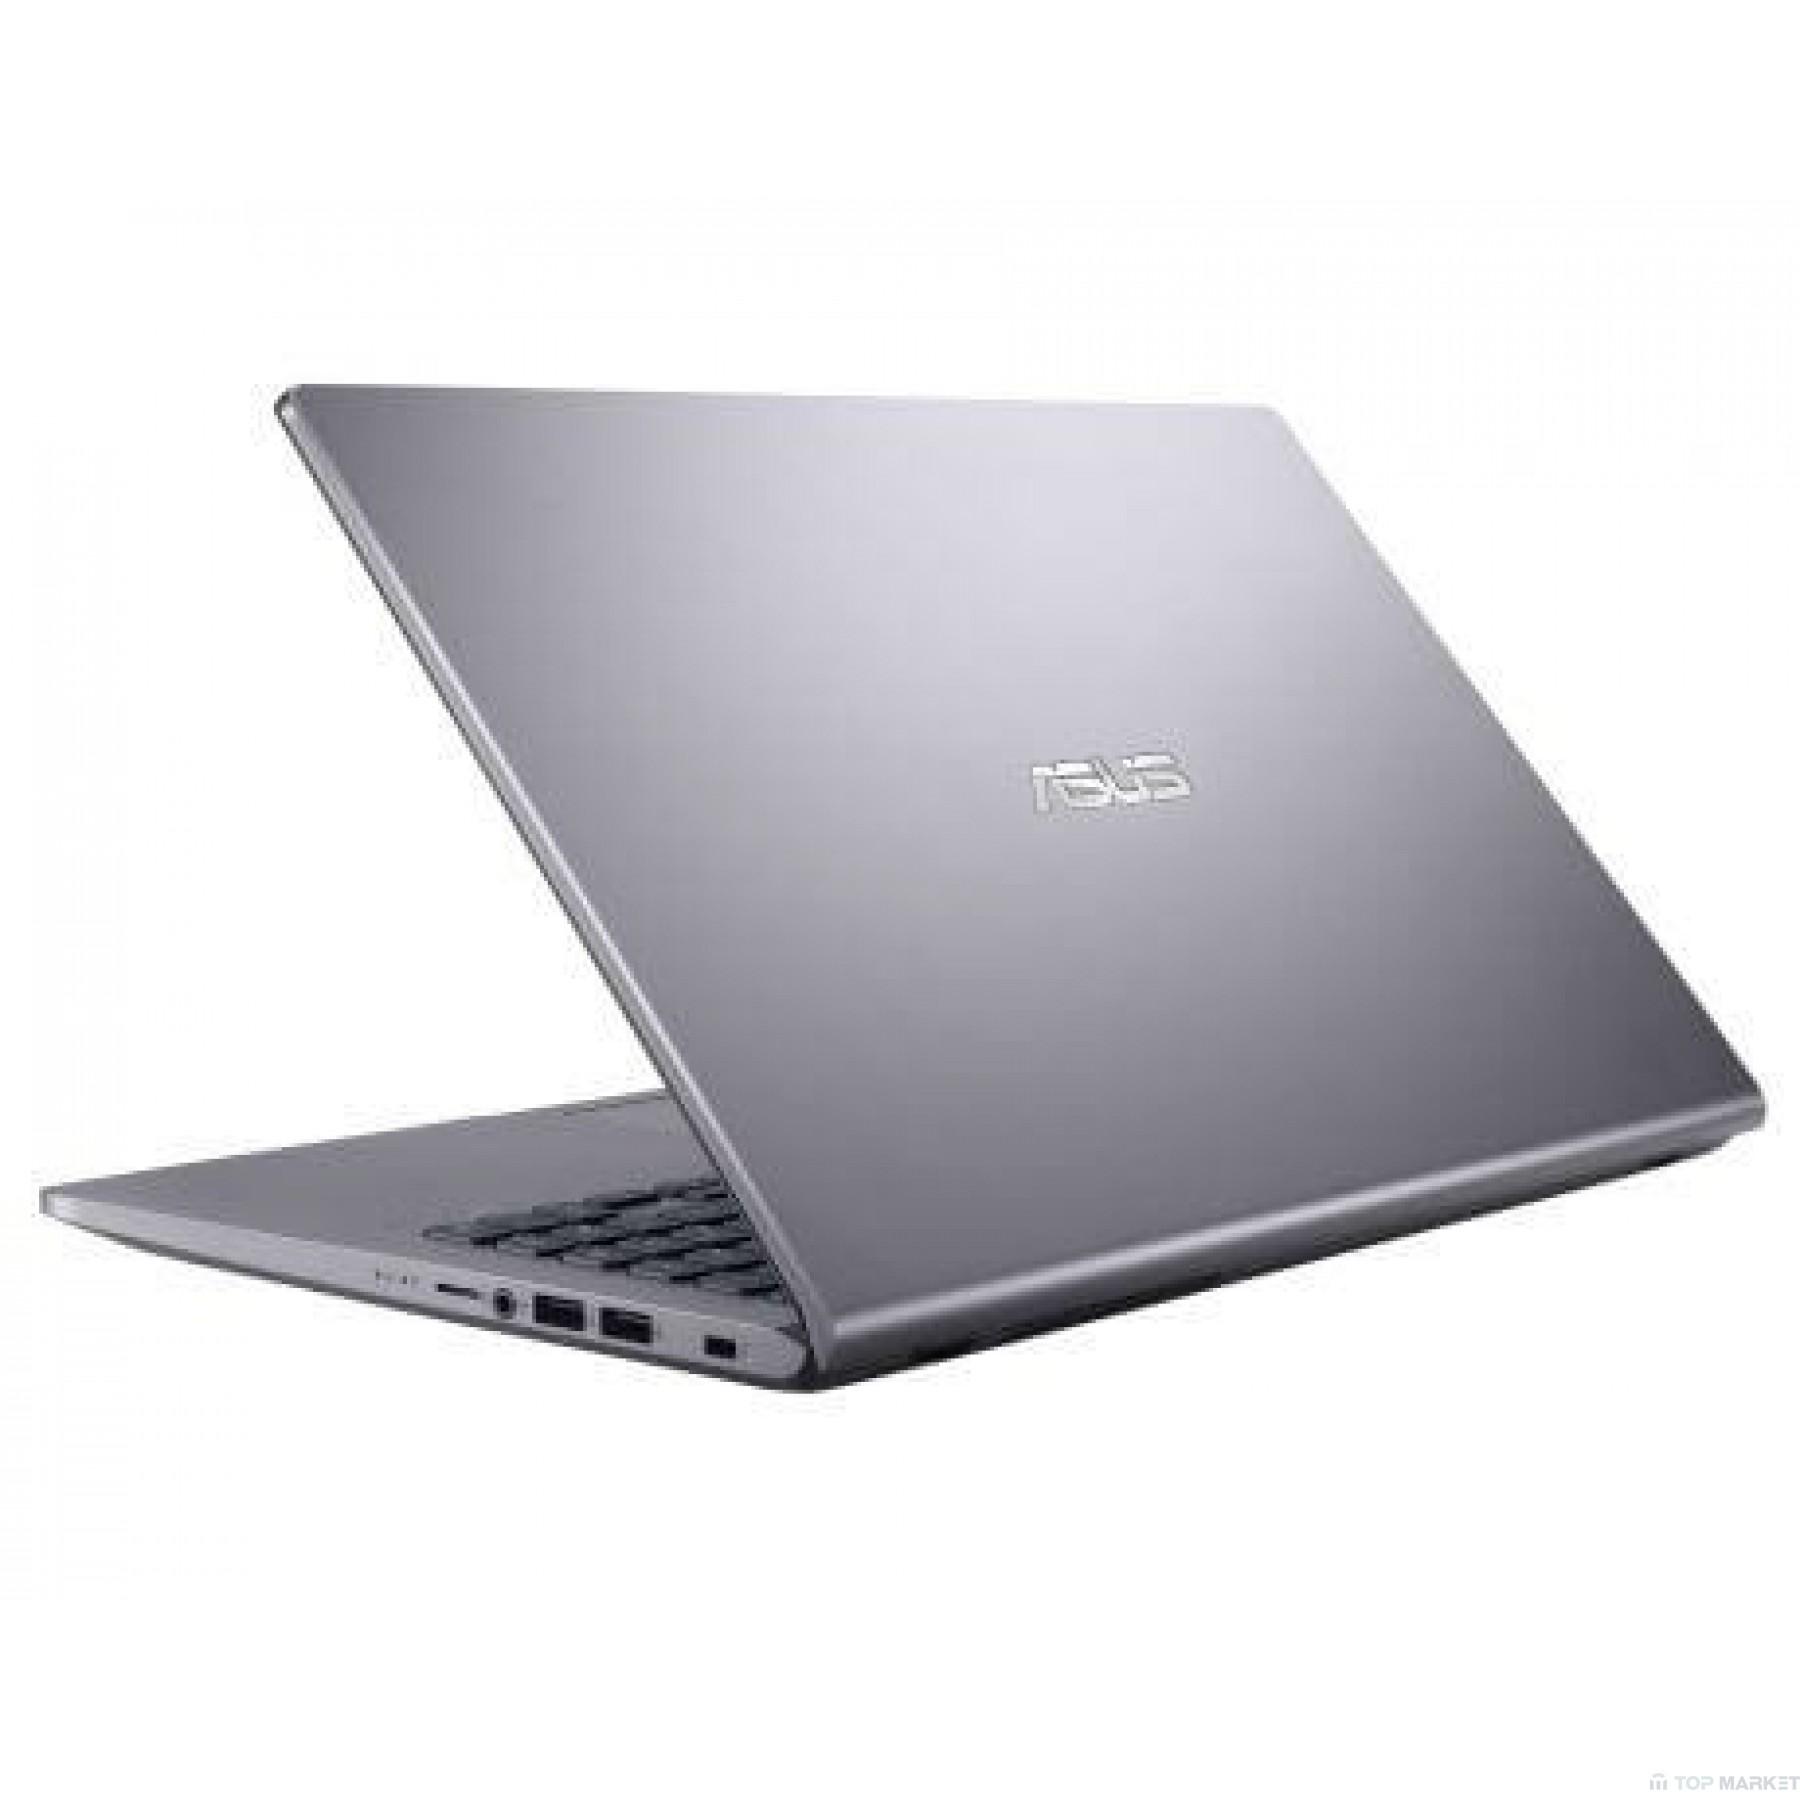 Лаптоп ASUS M509DA-WB501 /RYZEN 3500U